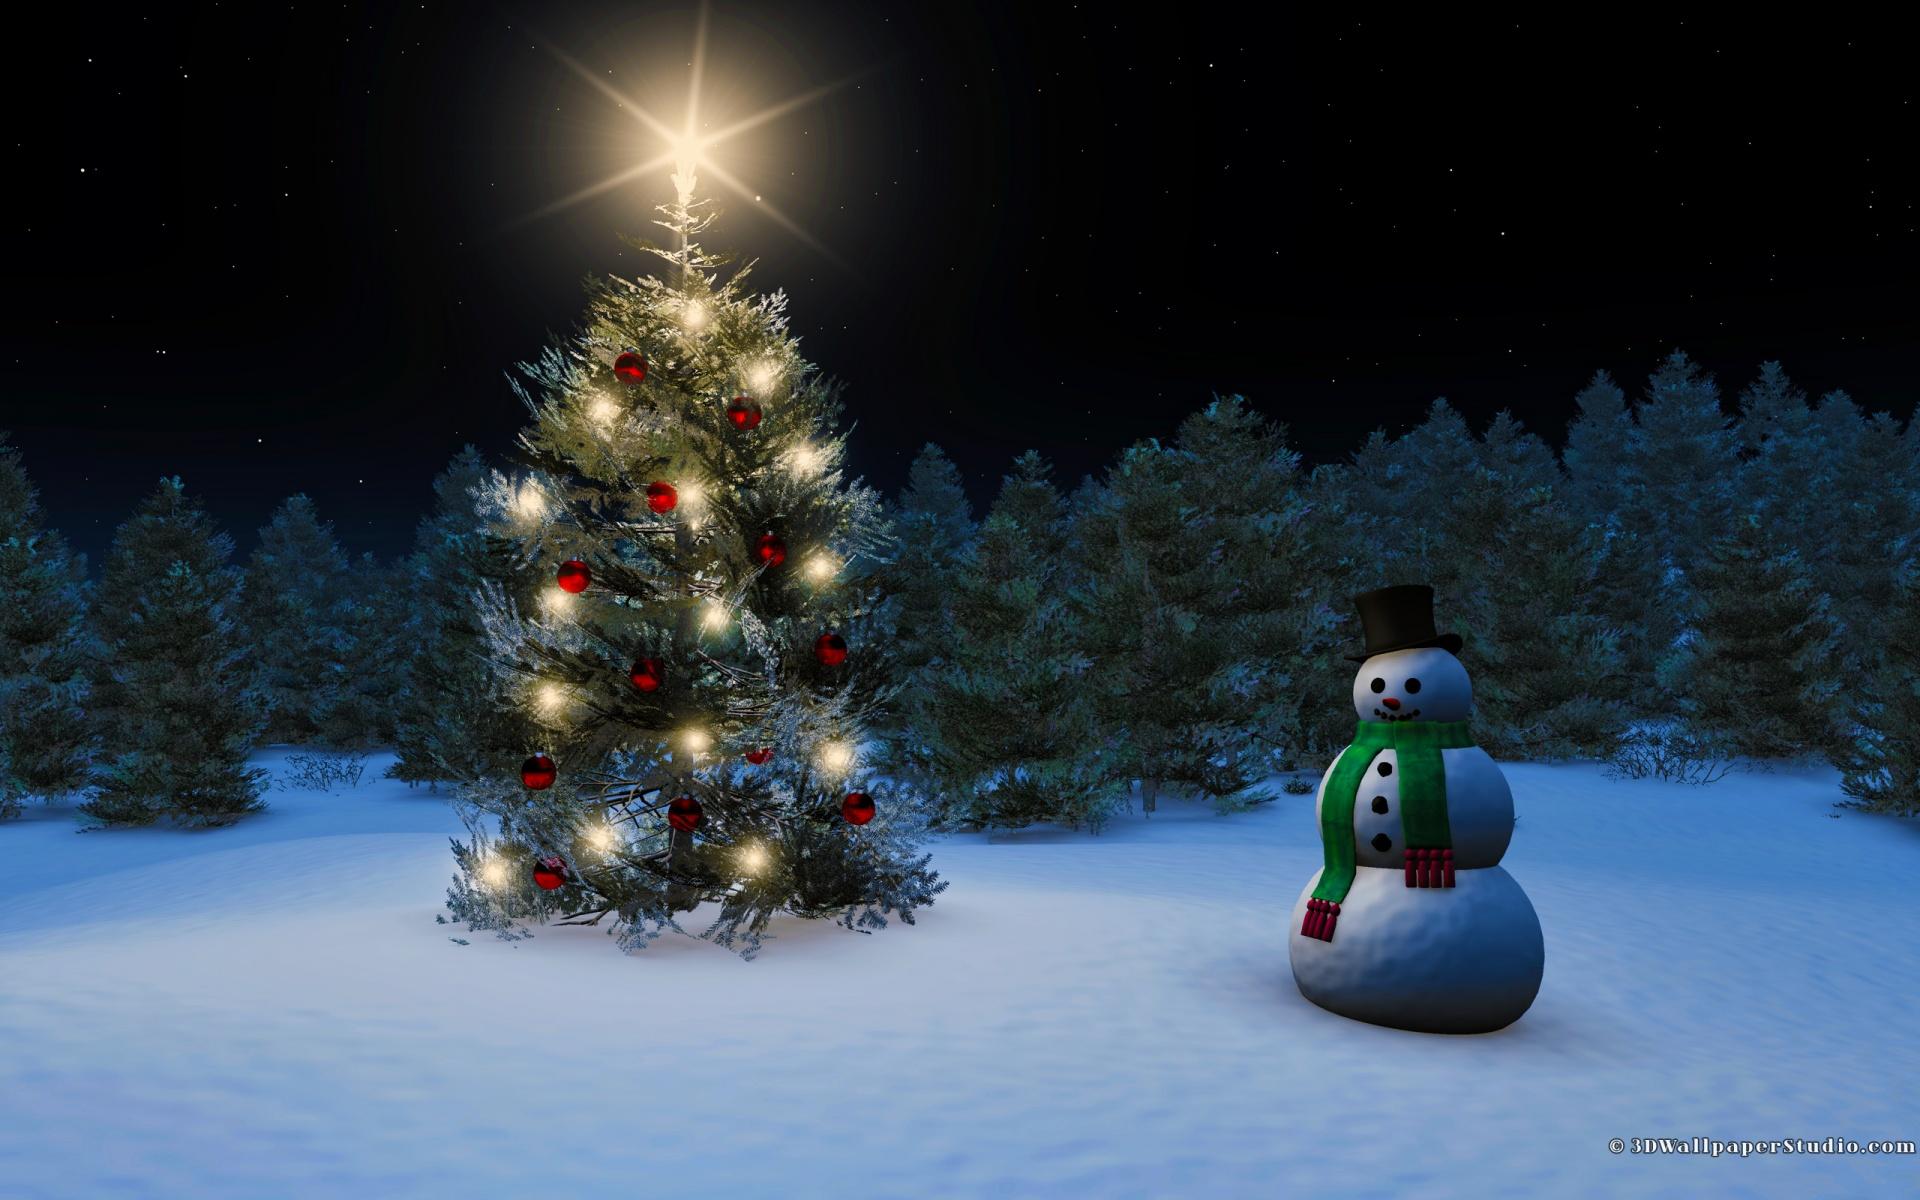 Snowman Snow Christmas tree Christmas 1920x1200 1920x1200